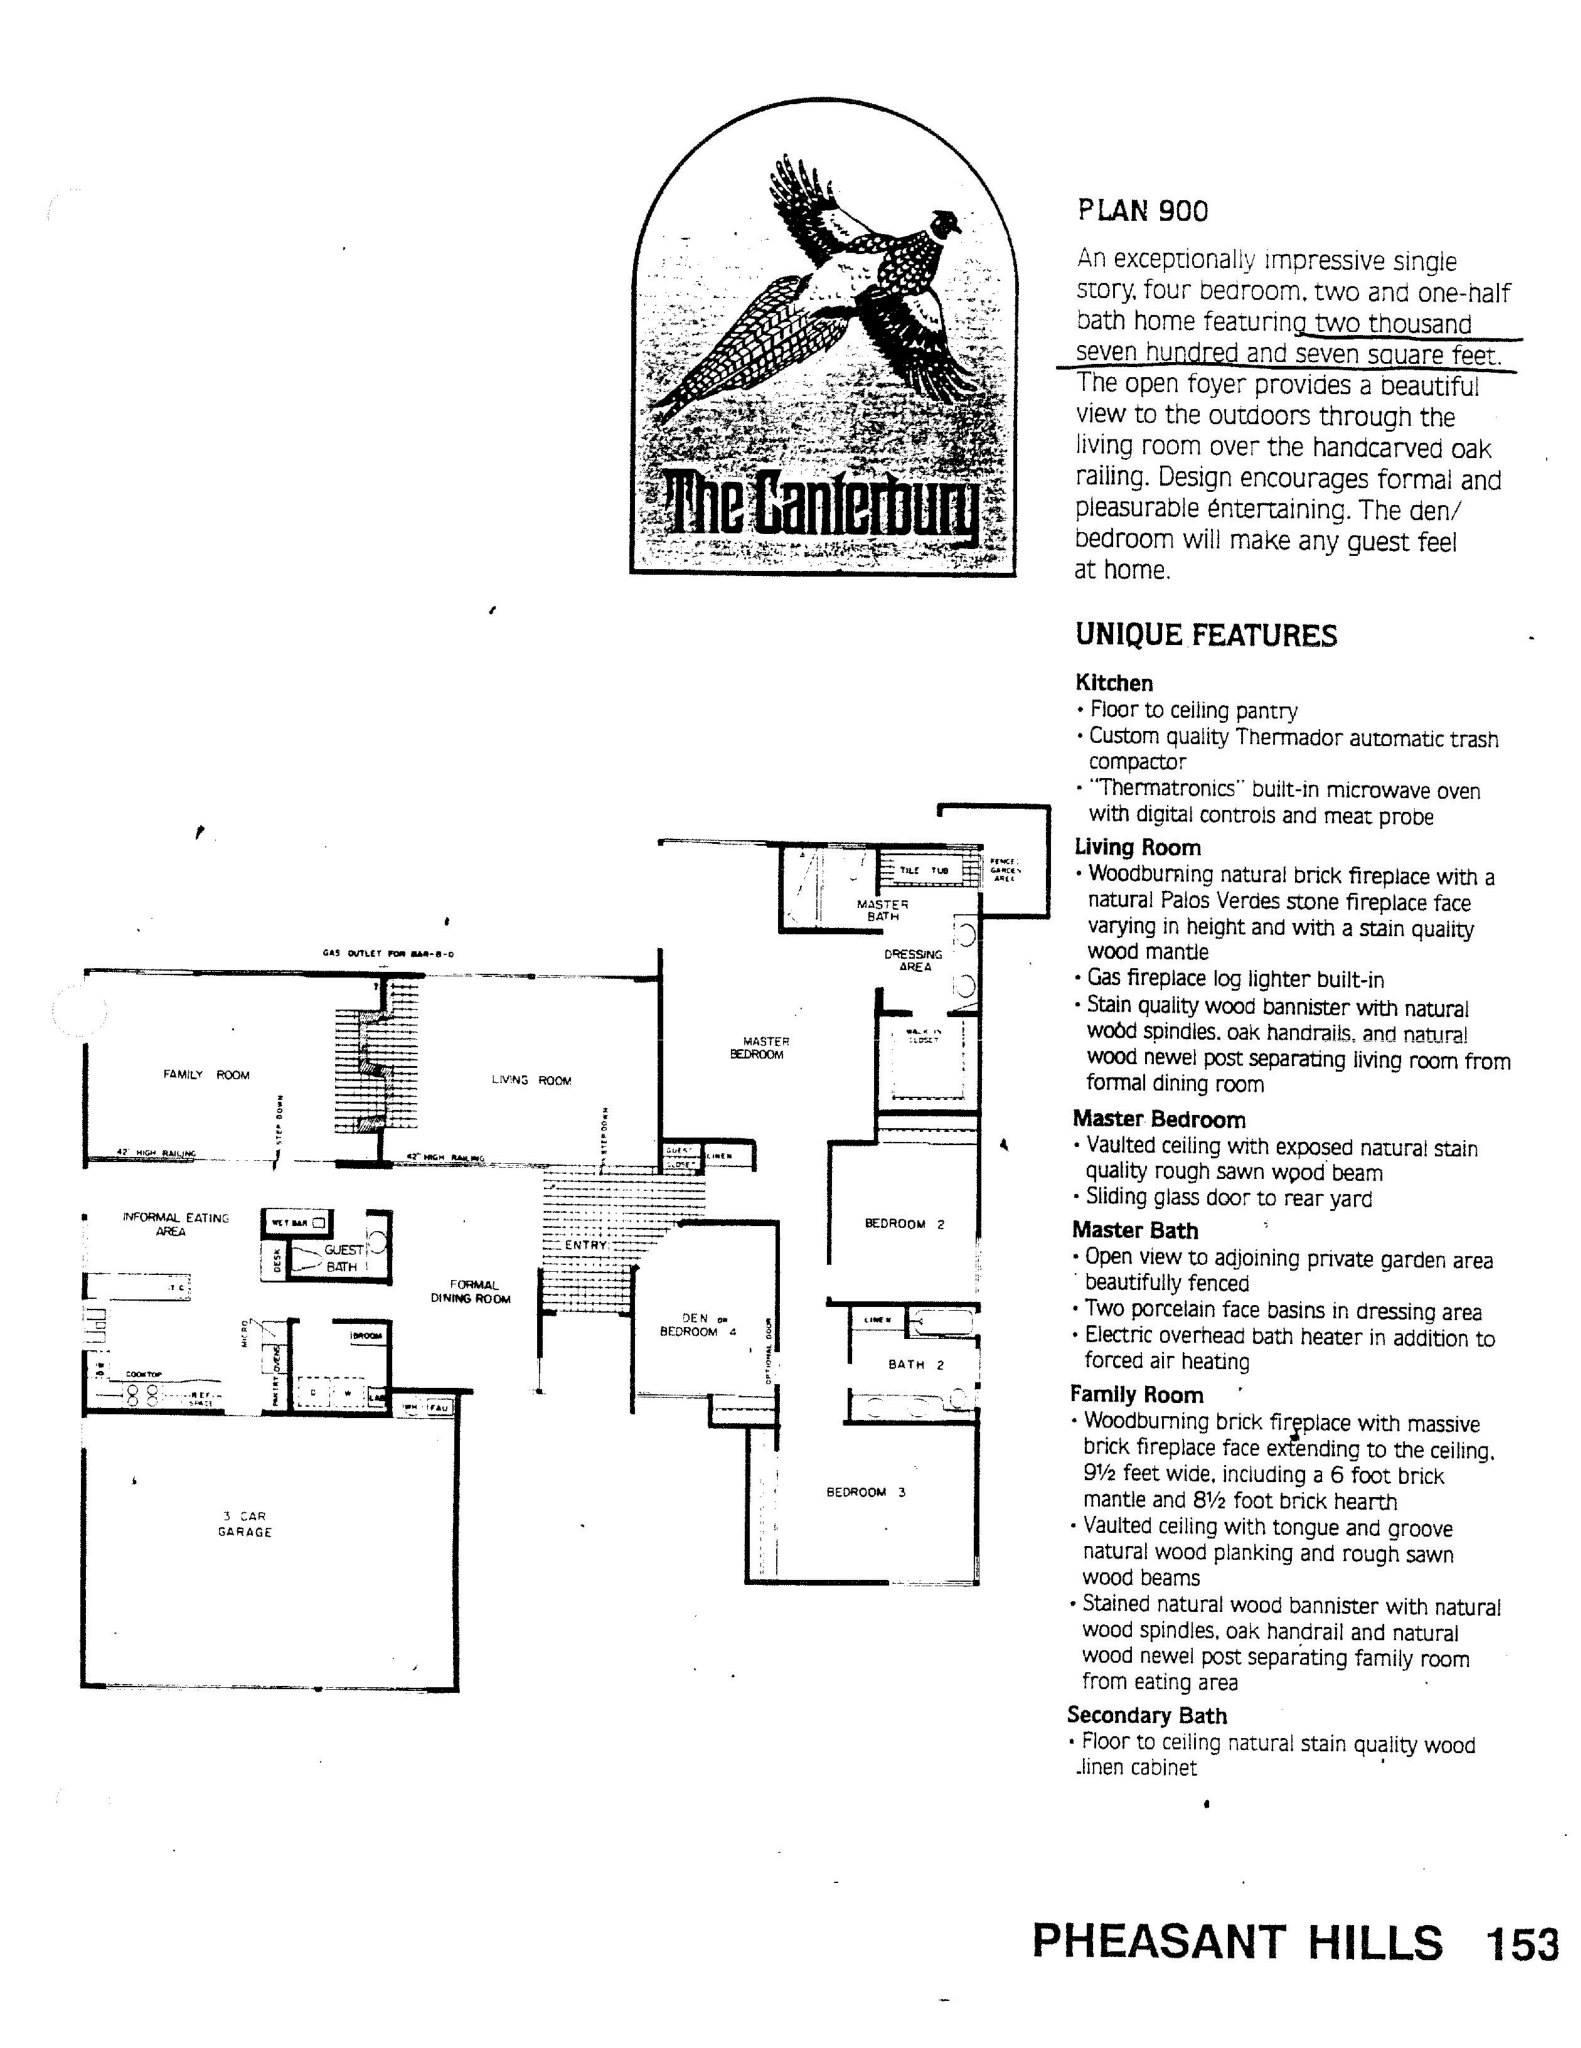 Pheasant Hills - The Canterbury - Plan 900